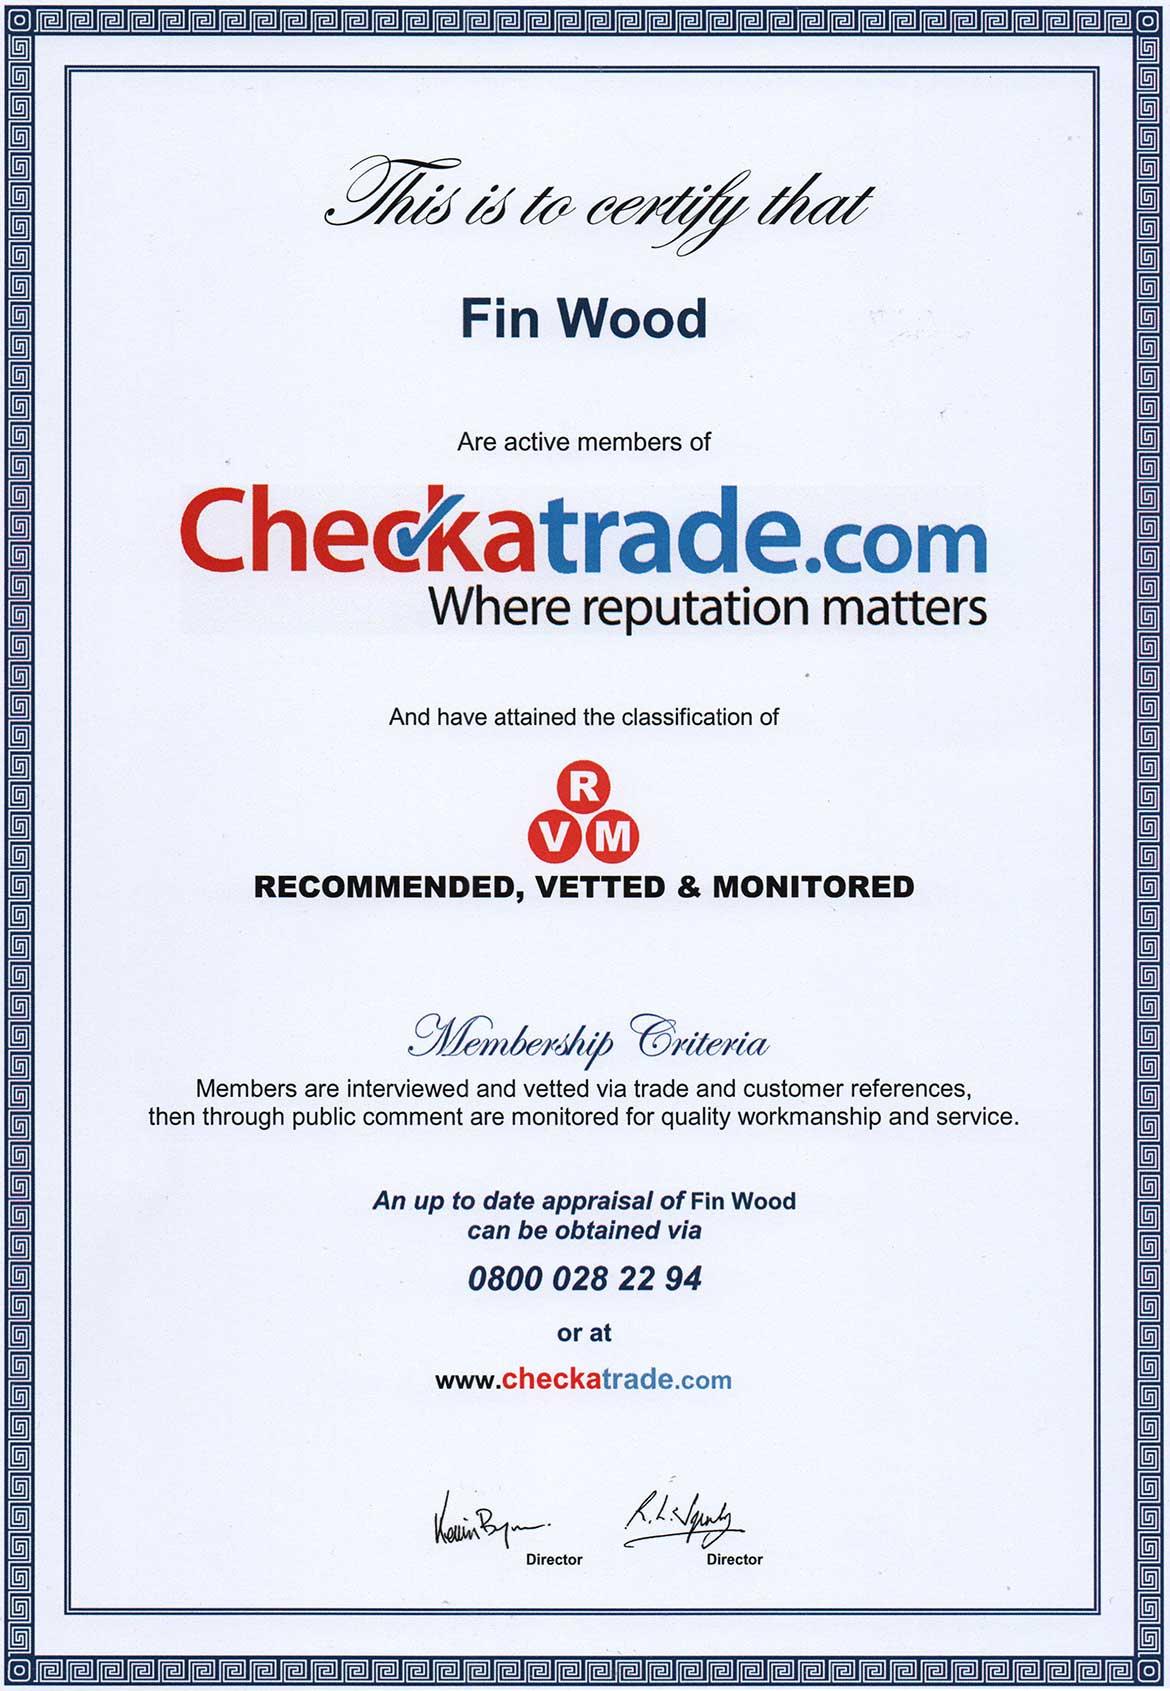 Checkatrade certificate